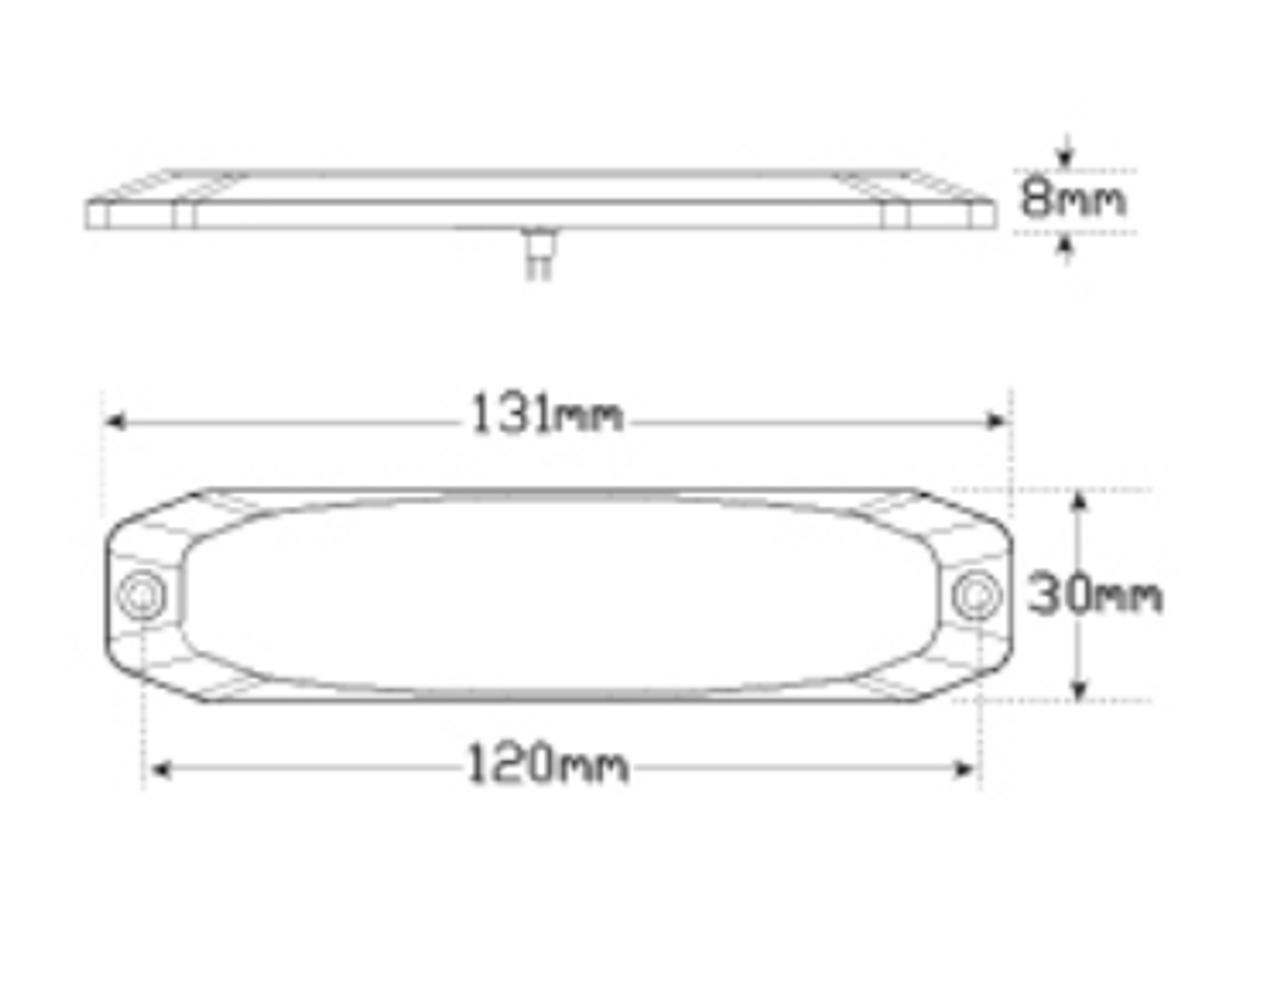 Line Drawing - 120035WM - Emergency Lamp Strobe White Clear Lens Multi-volt Single Pack. AL. Ultimate LED.